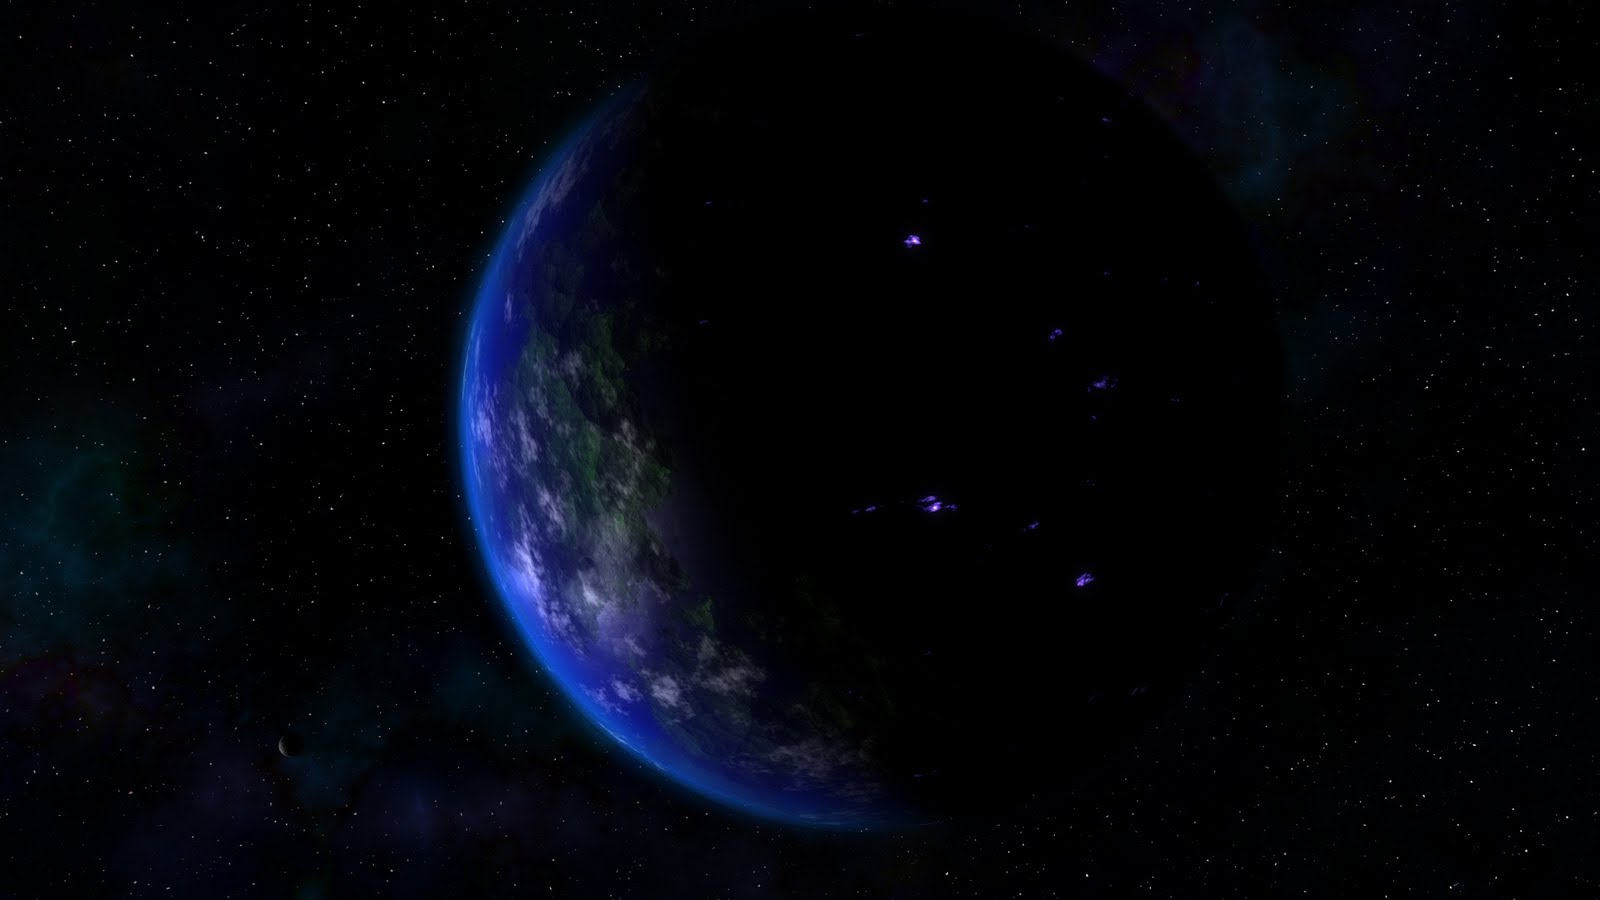 Earth Wallpaper Full Hd: Earth Wallpaper HD 1080p